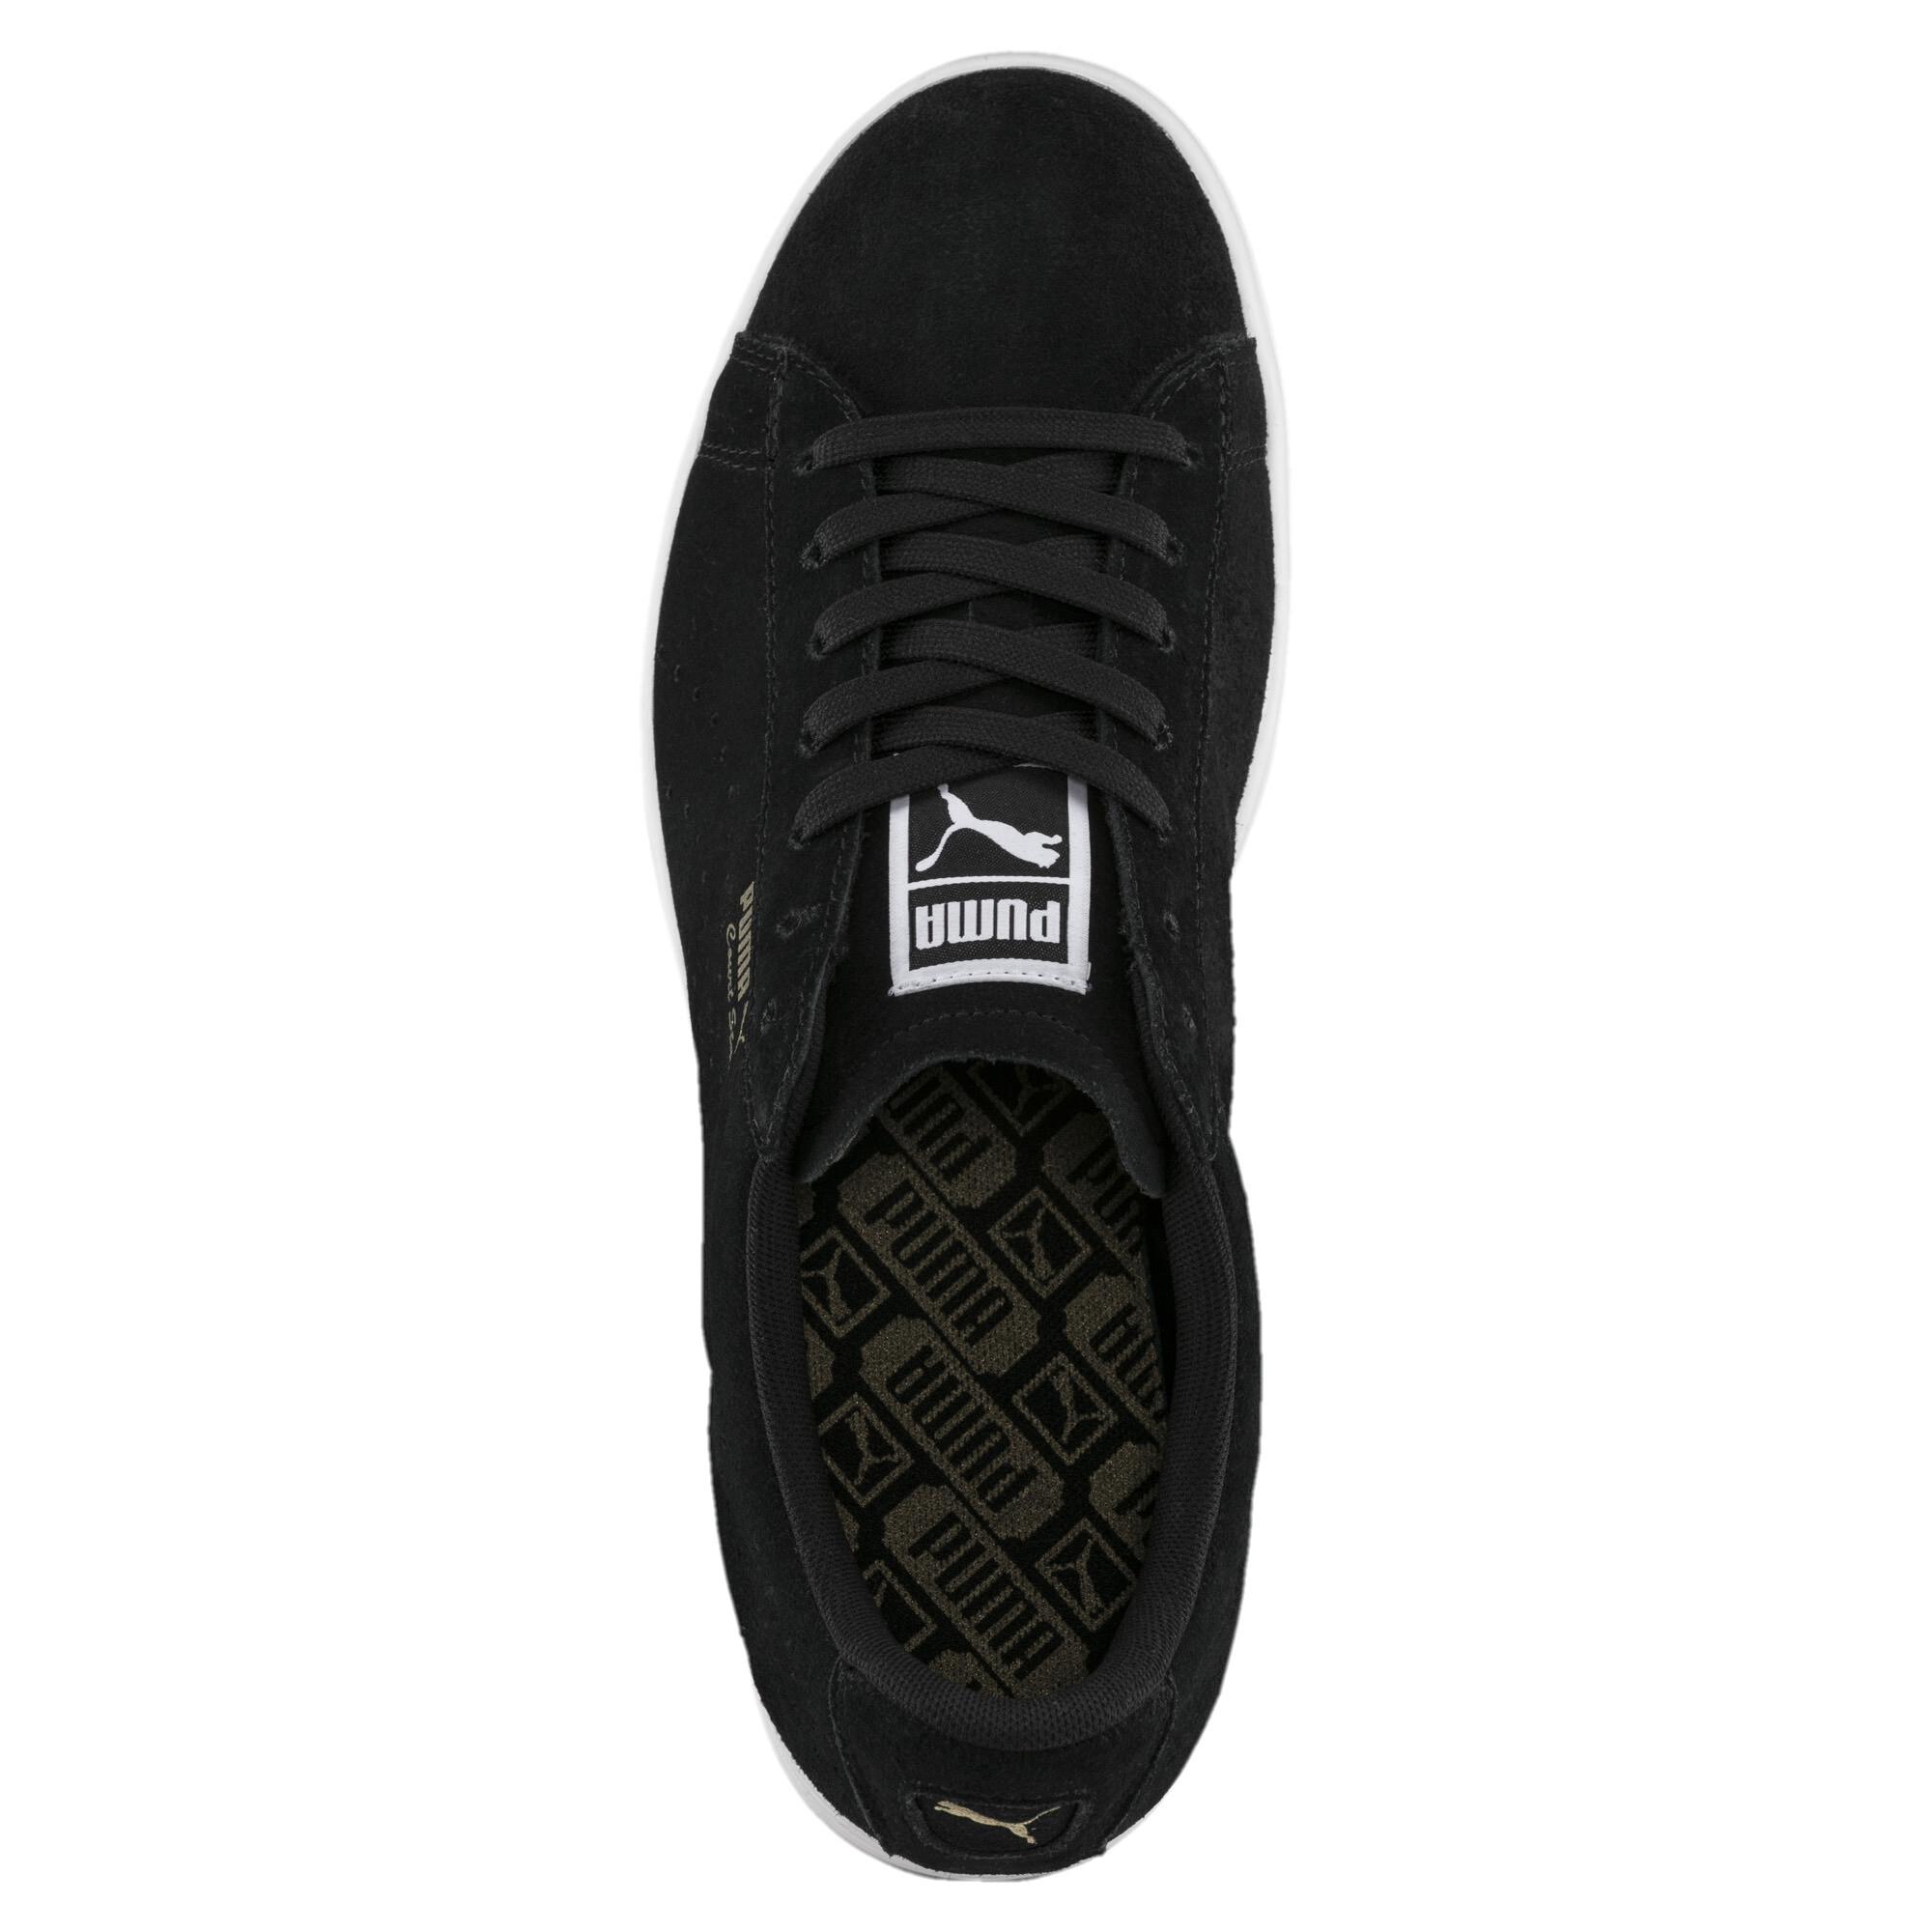 PUMA-Court-Star-Suede-Sneakers-Unisex-Shoe-Sport-Classics thumbnail 18